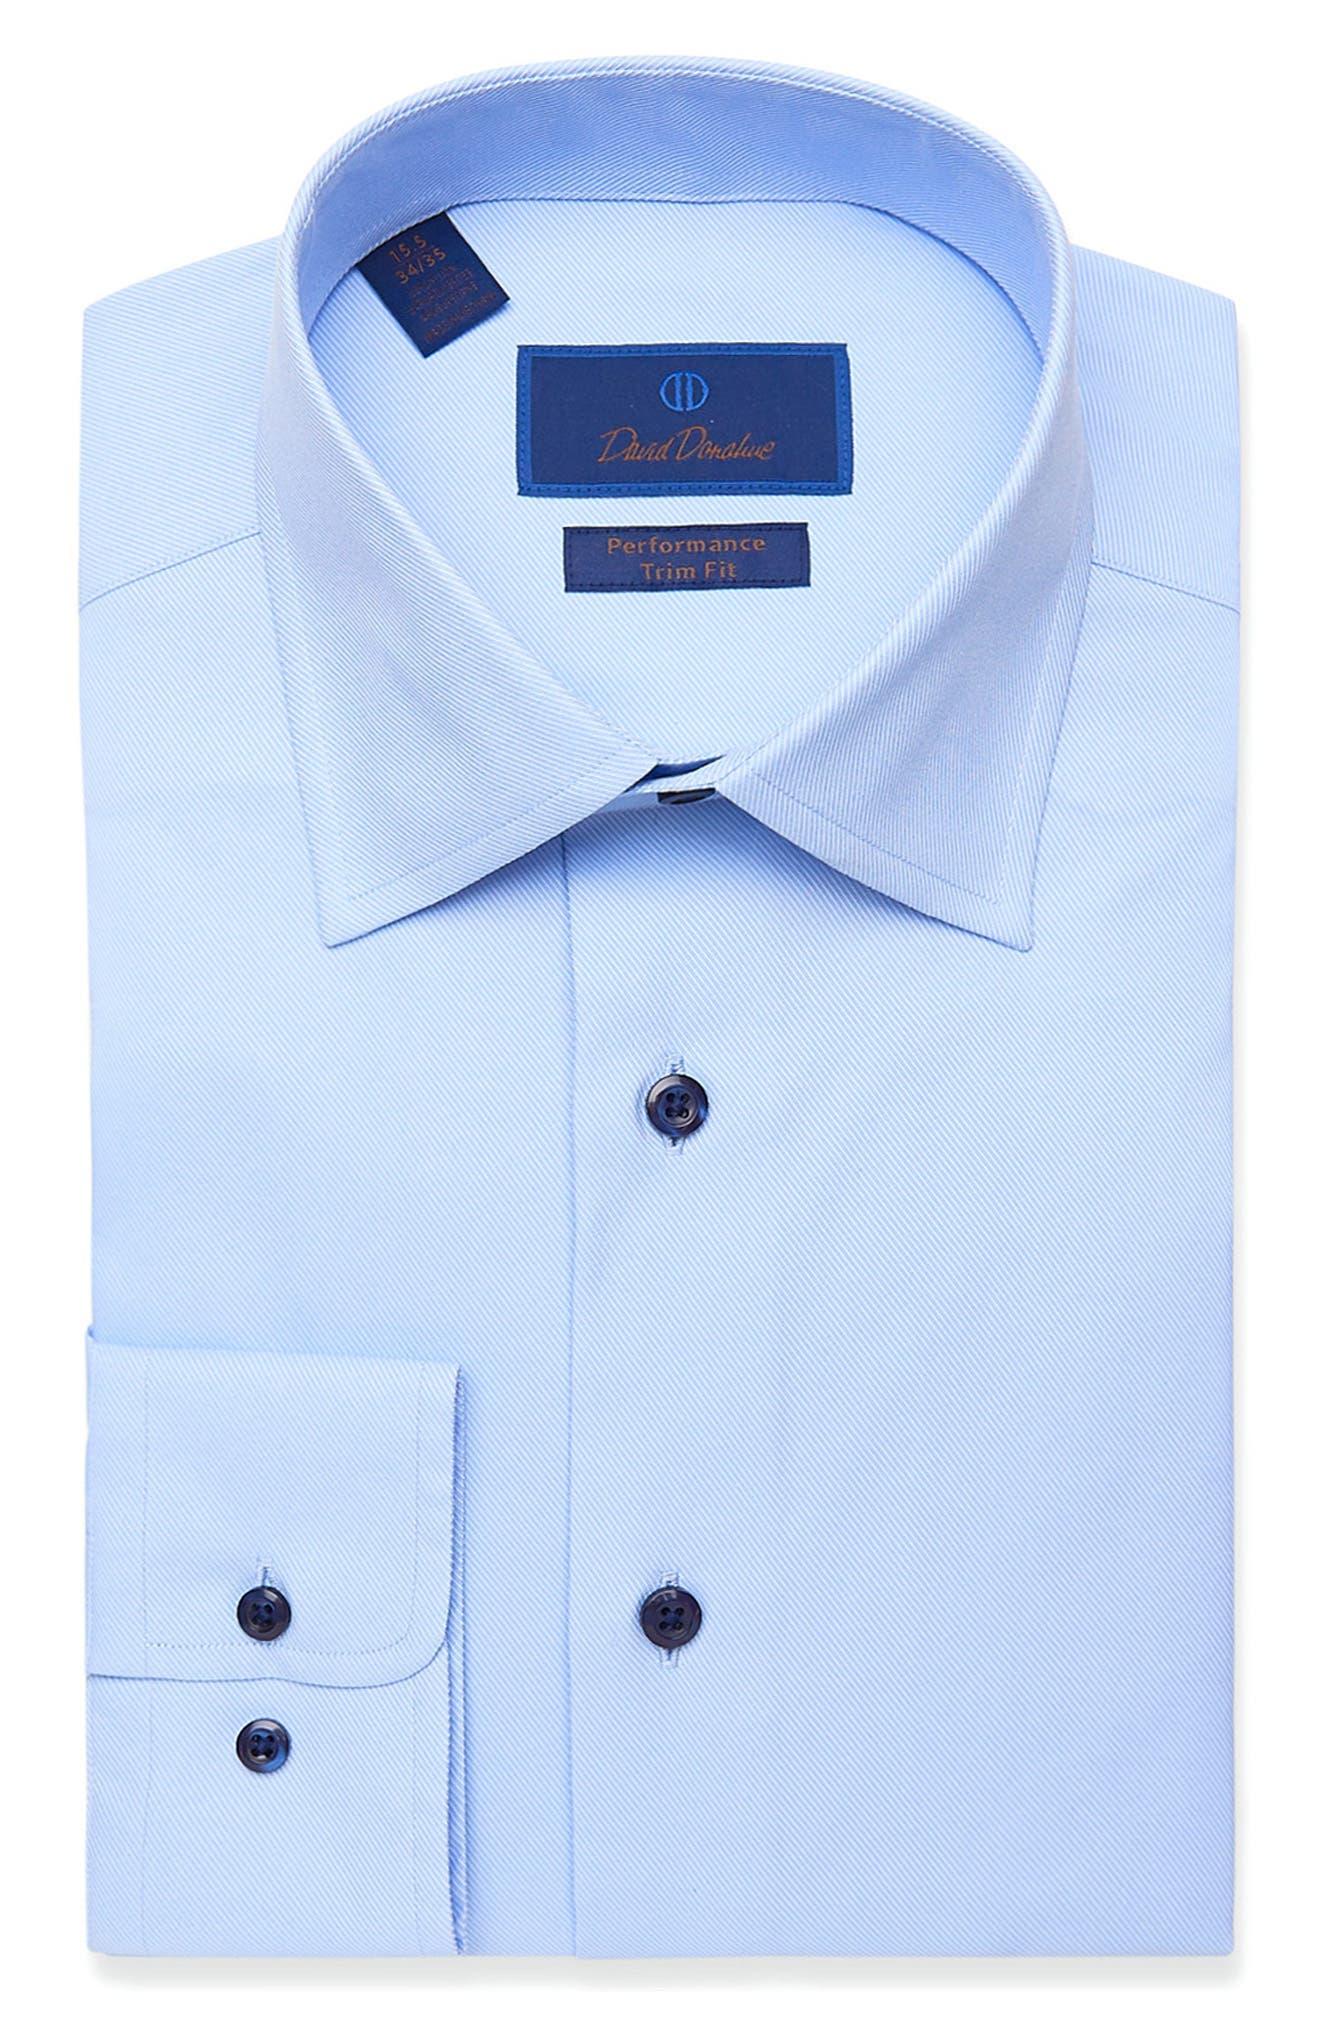 Trim Fit Peformance Stretch Solid Dress Shirt